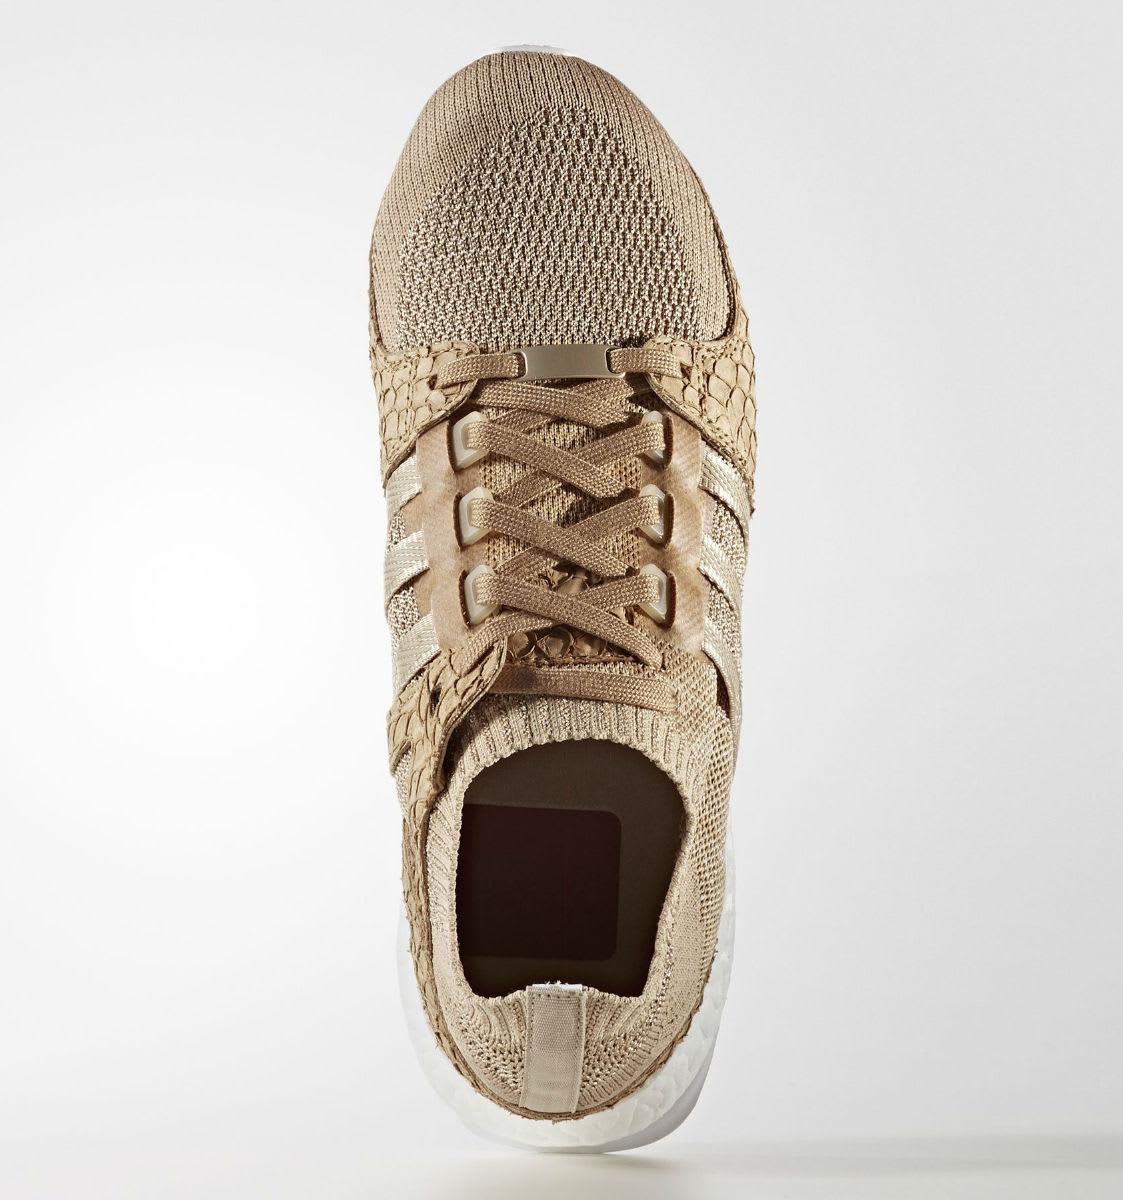 Pusha T x Adidas EQT Support Ultra Primeknit Brown Paper Bag Release Date DB0181 Top